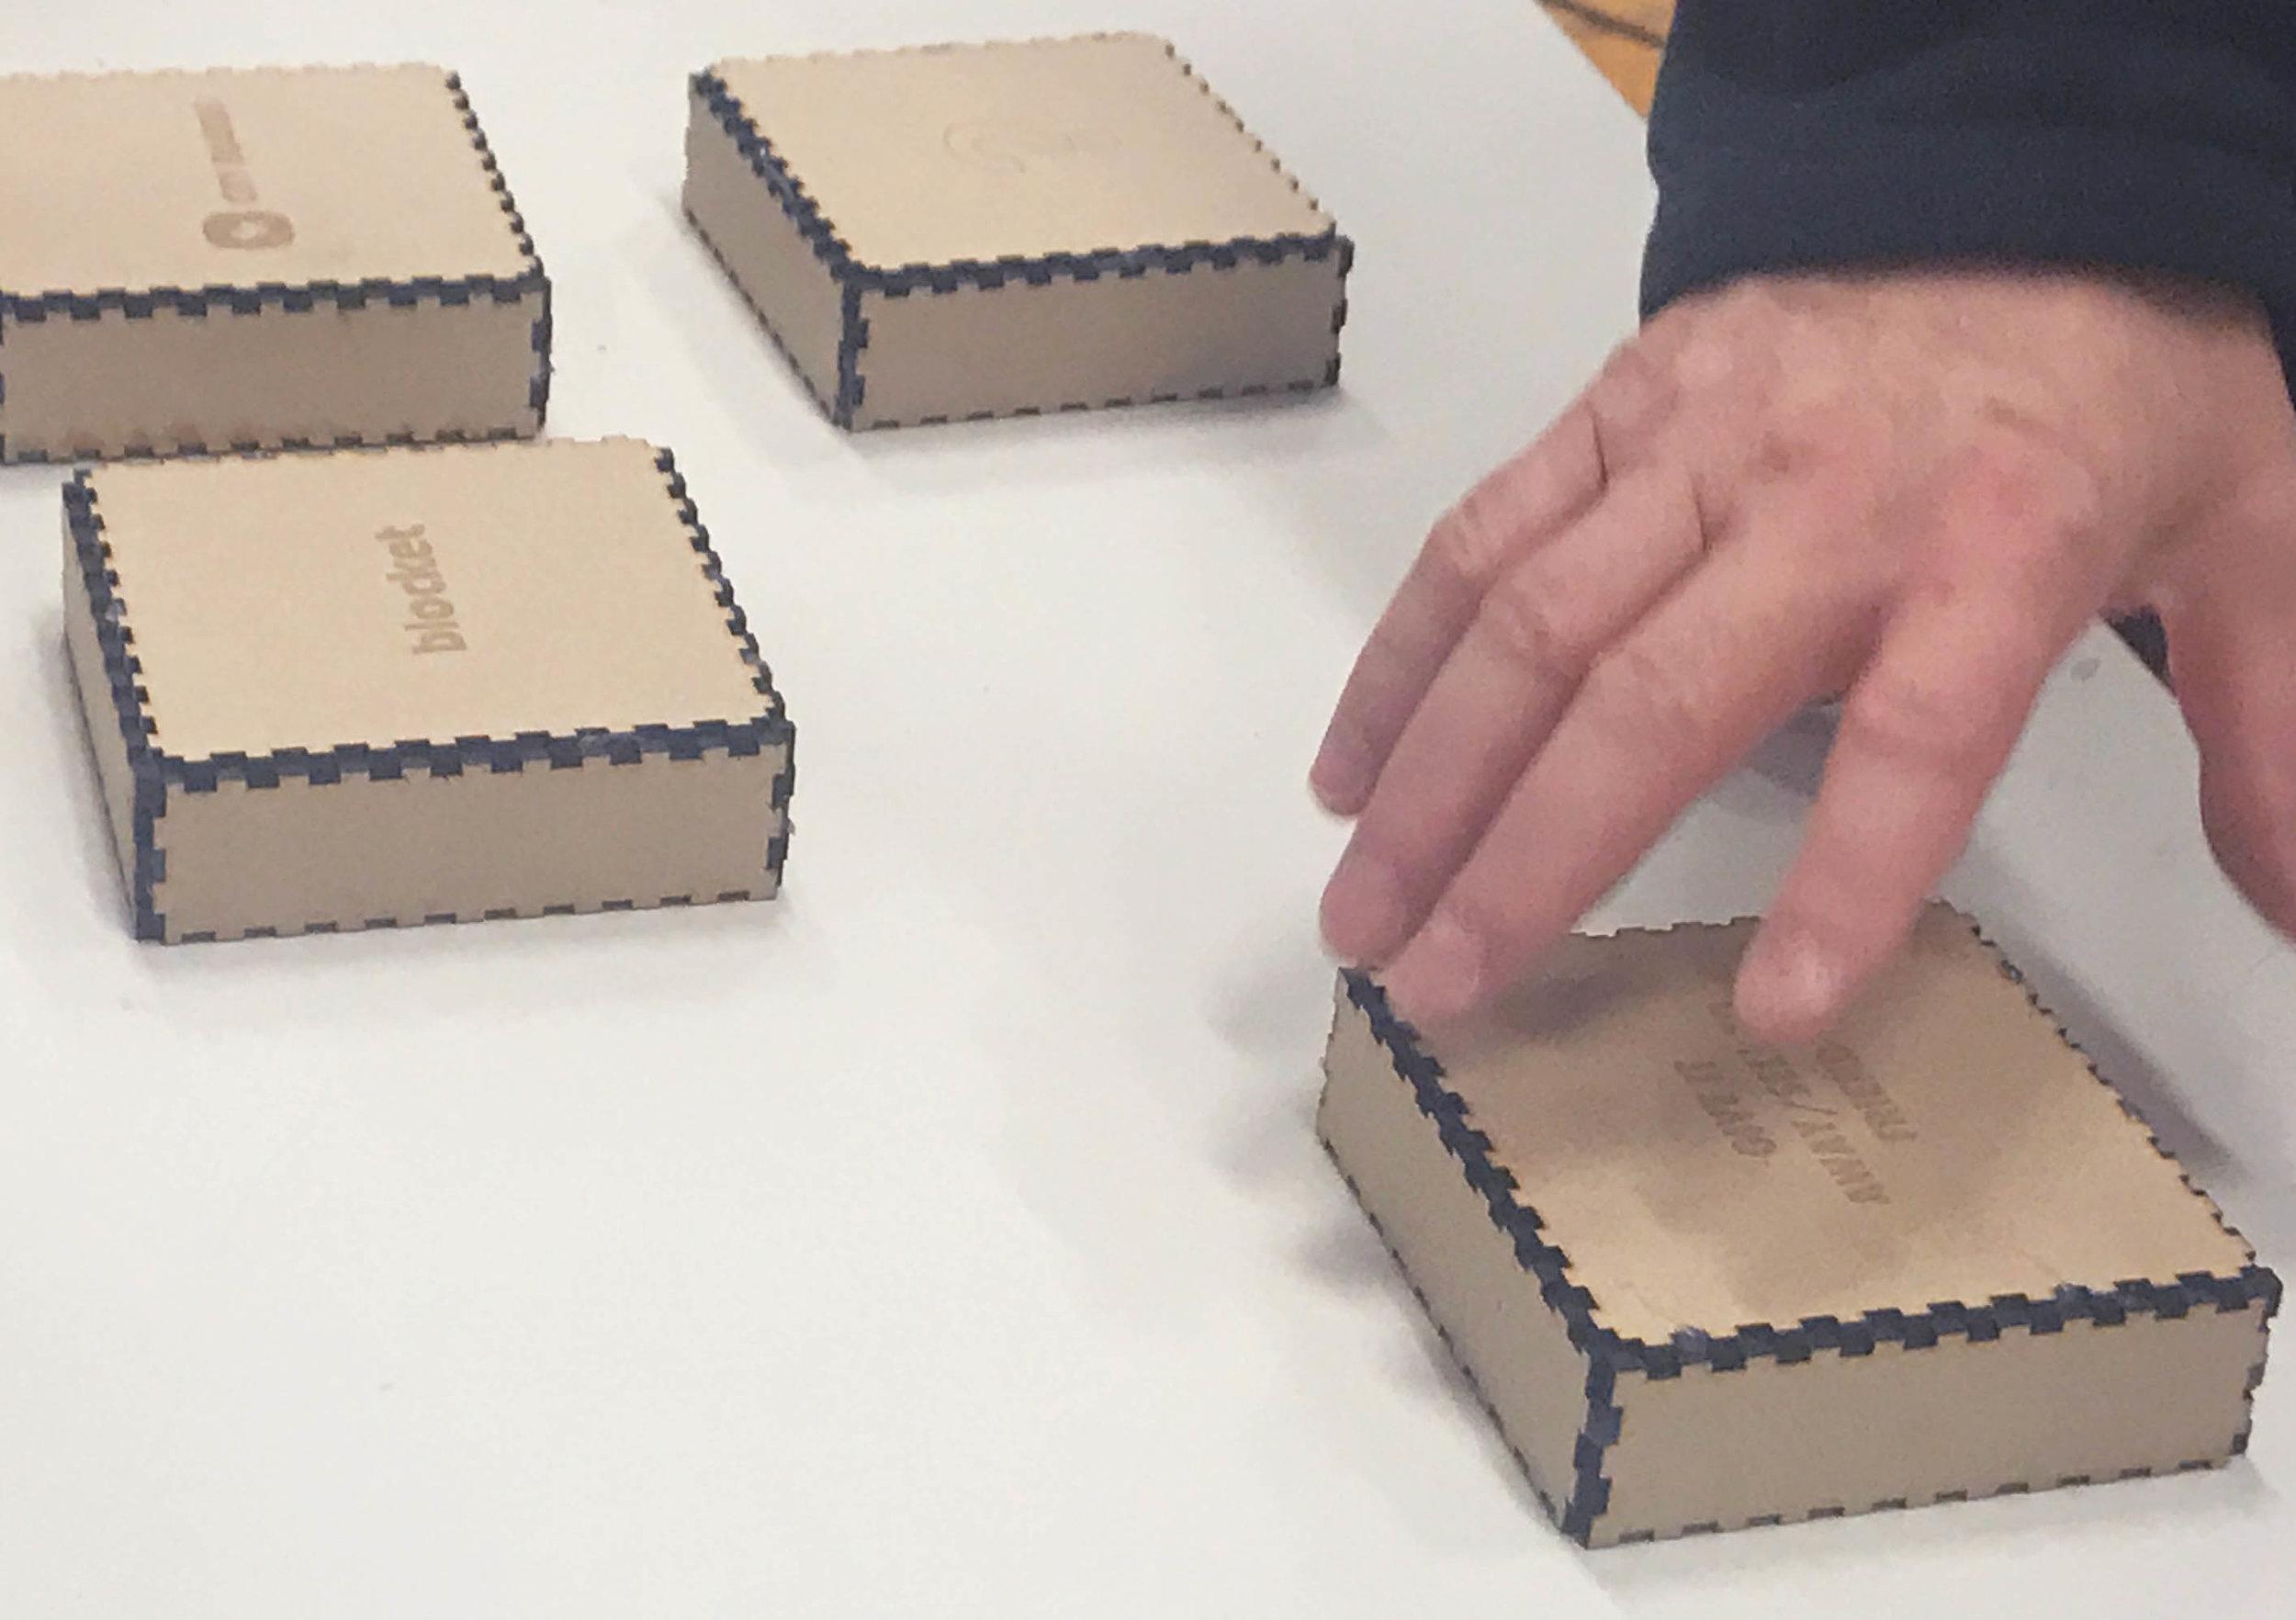 Under each box a guiding note was hidden